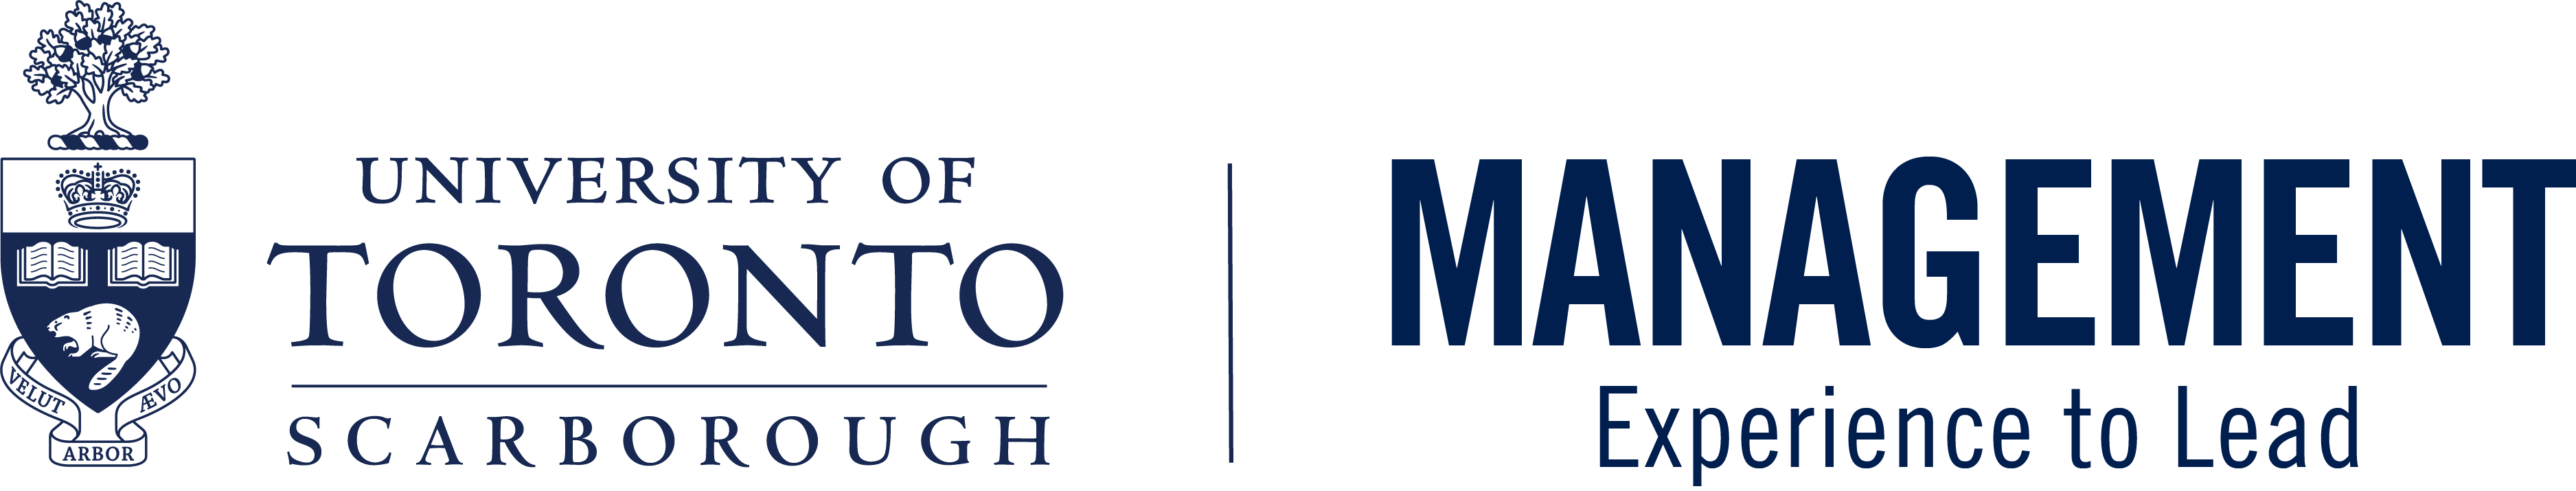 UTSC management logo